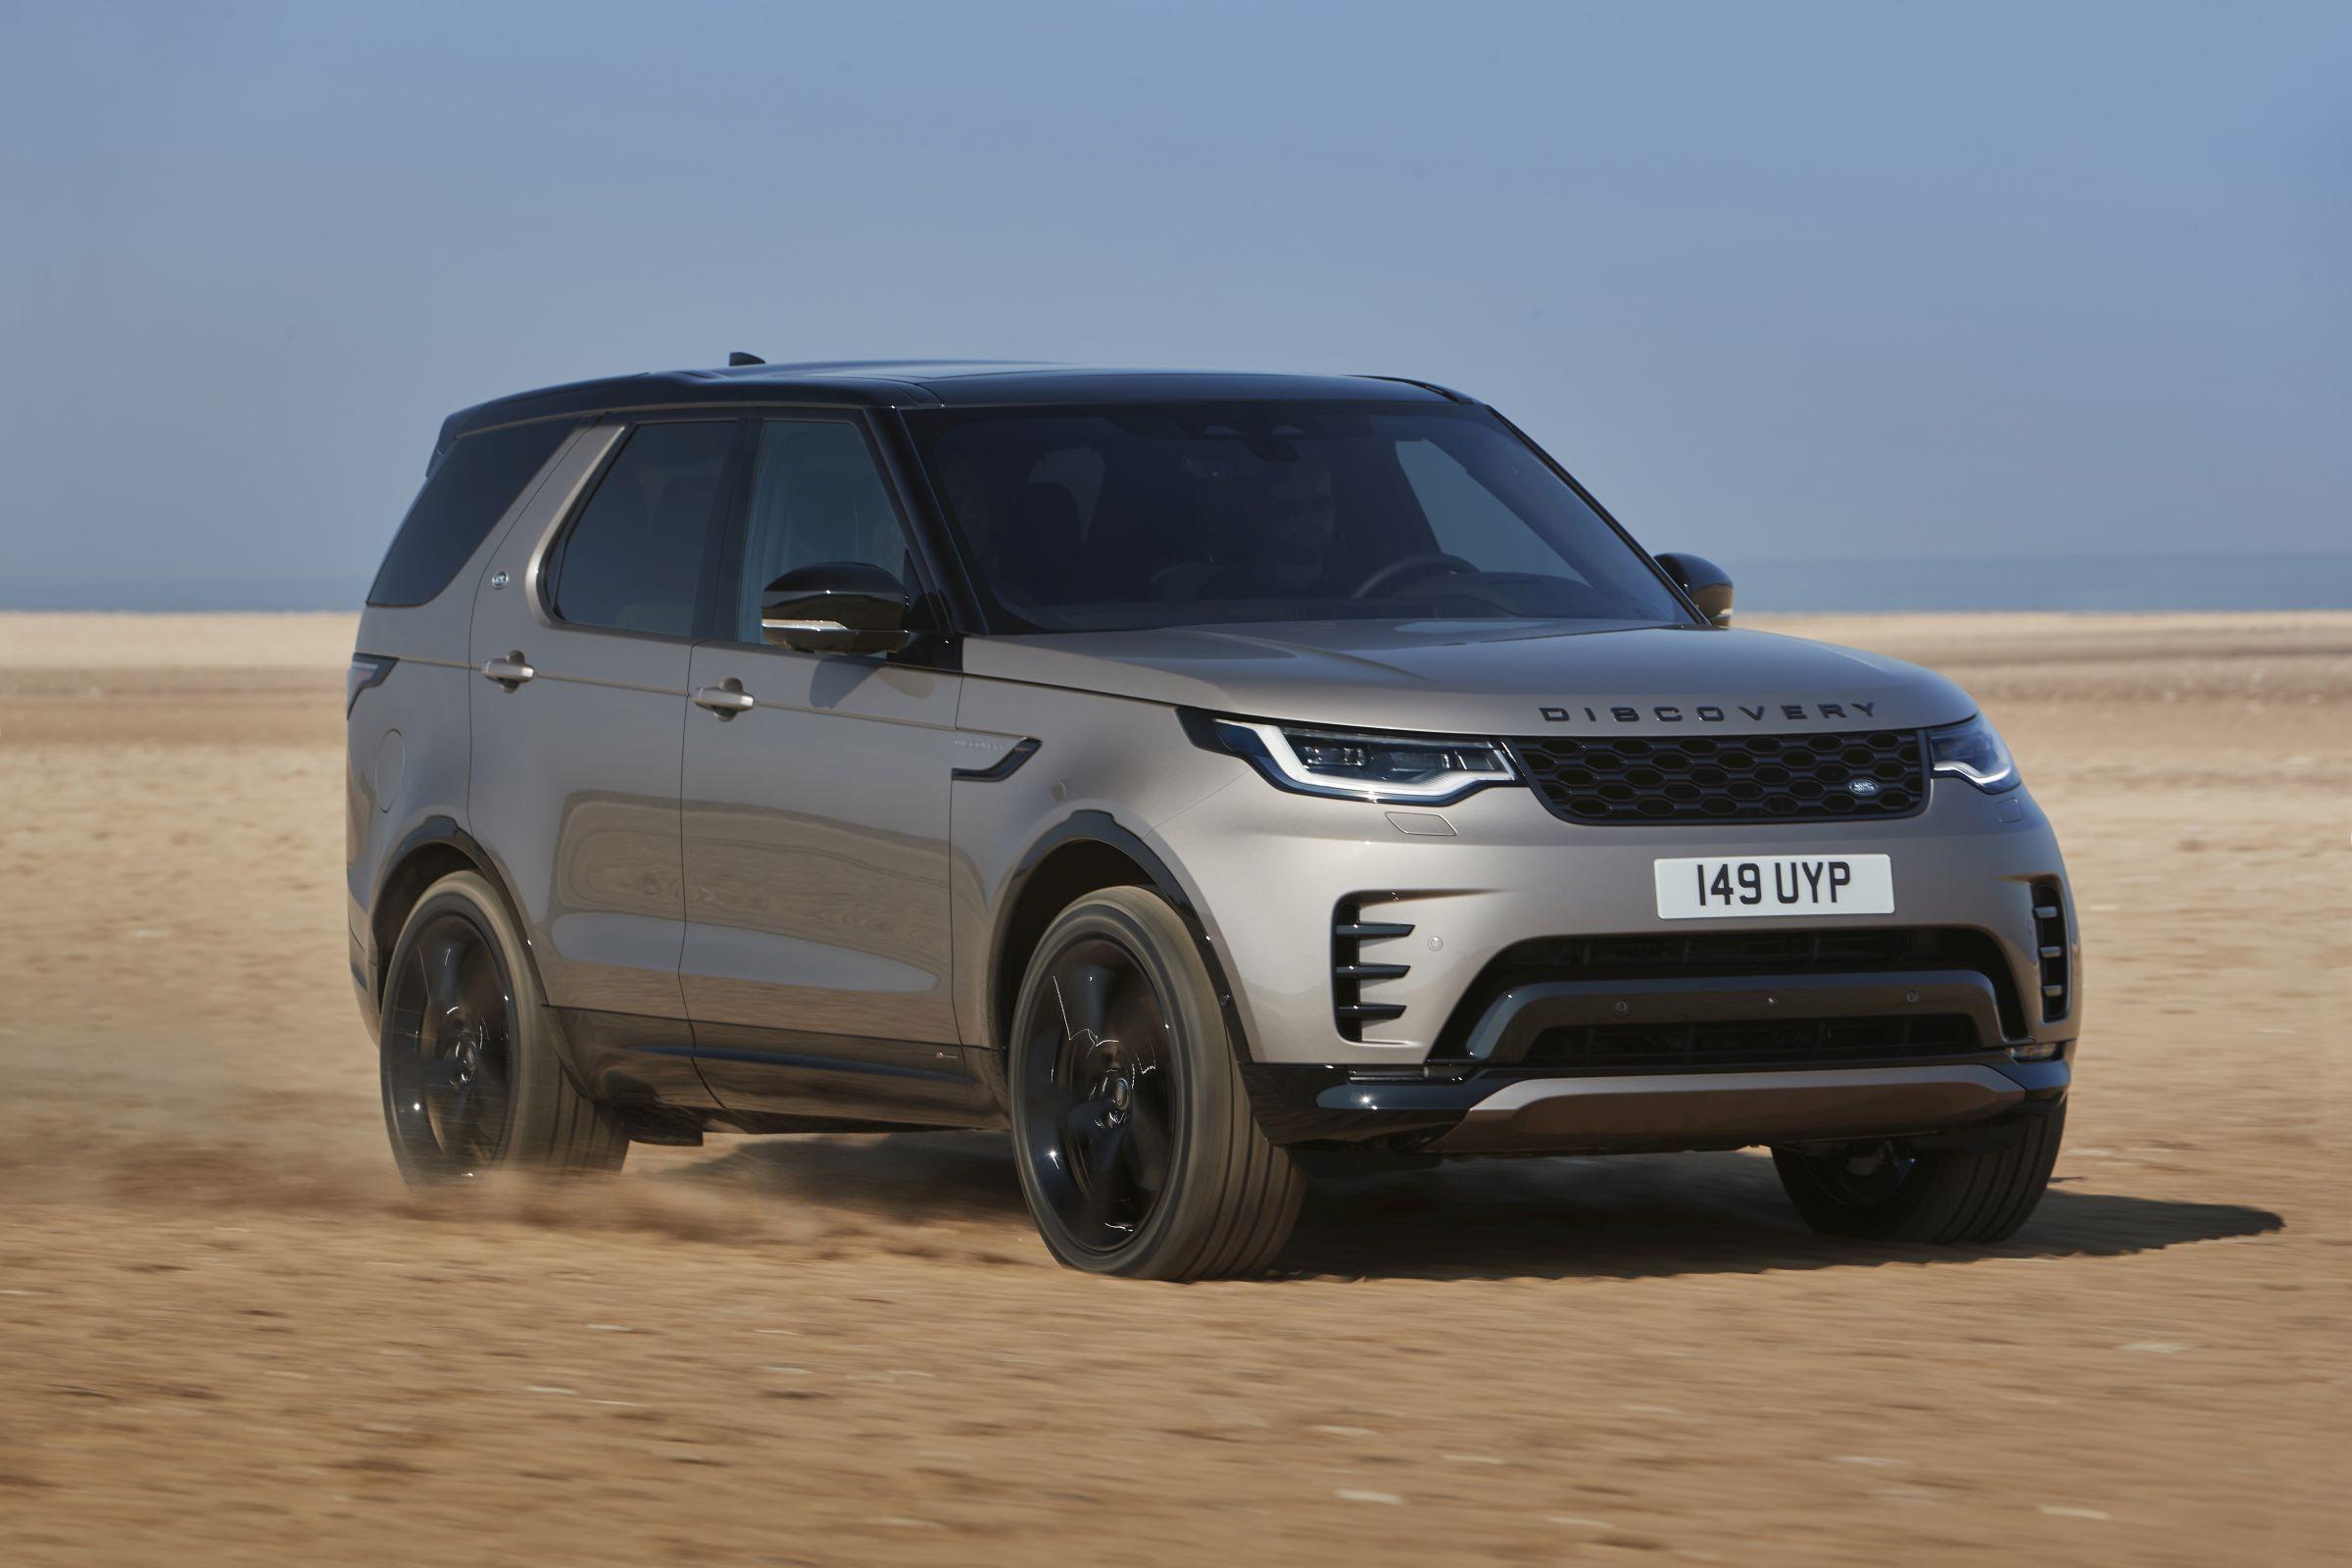 Recall da Land Rover convoca Discovery 2021